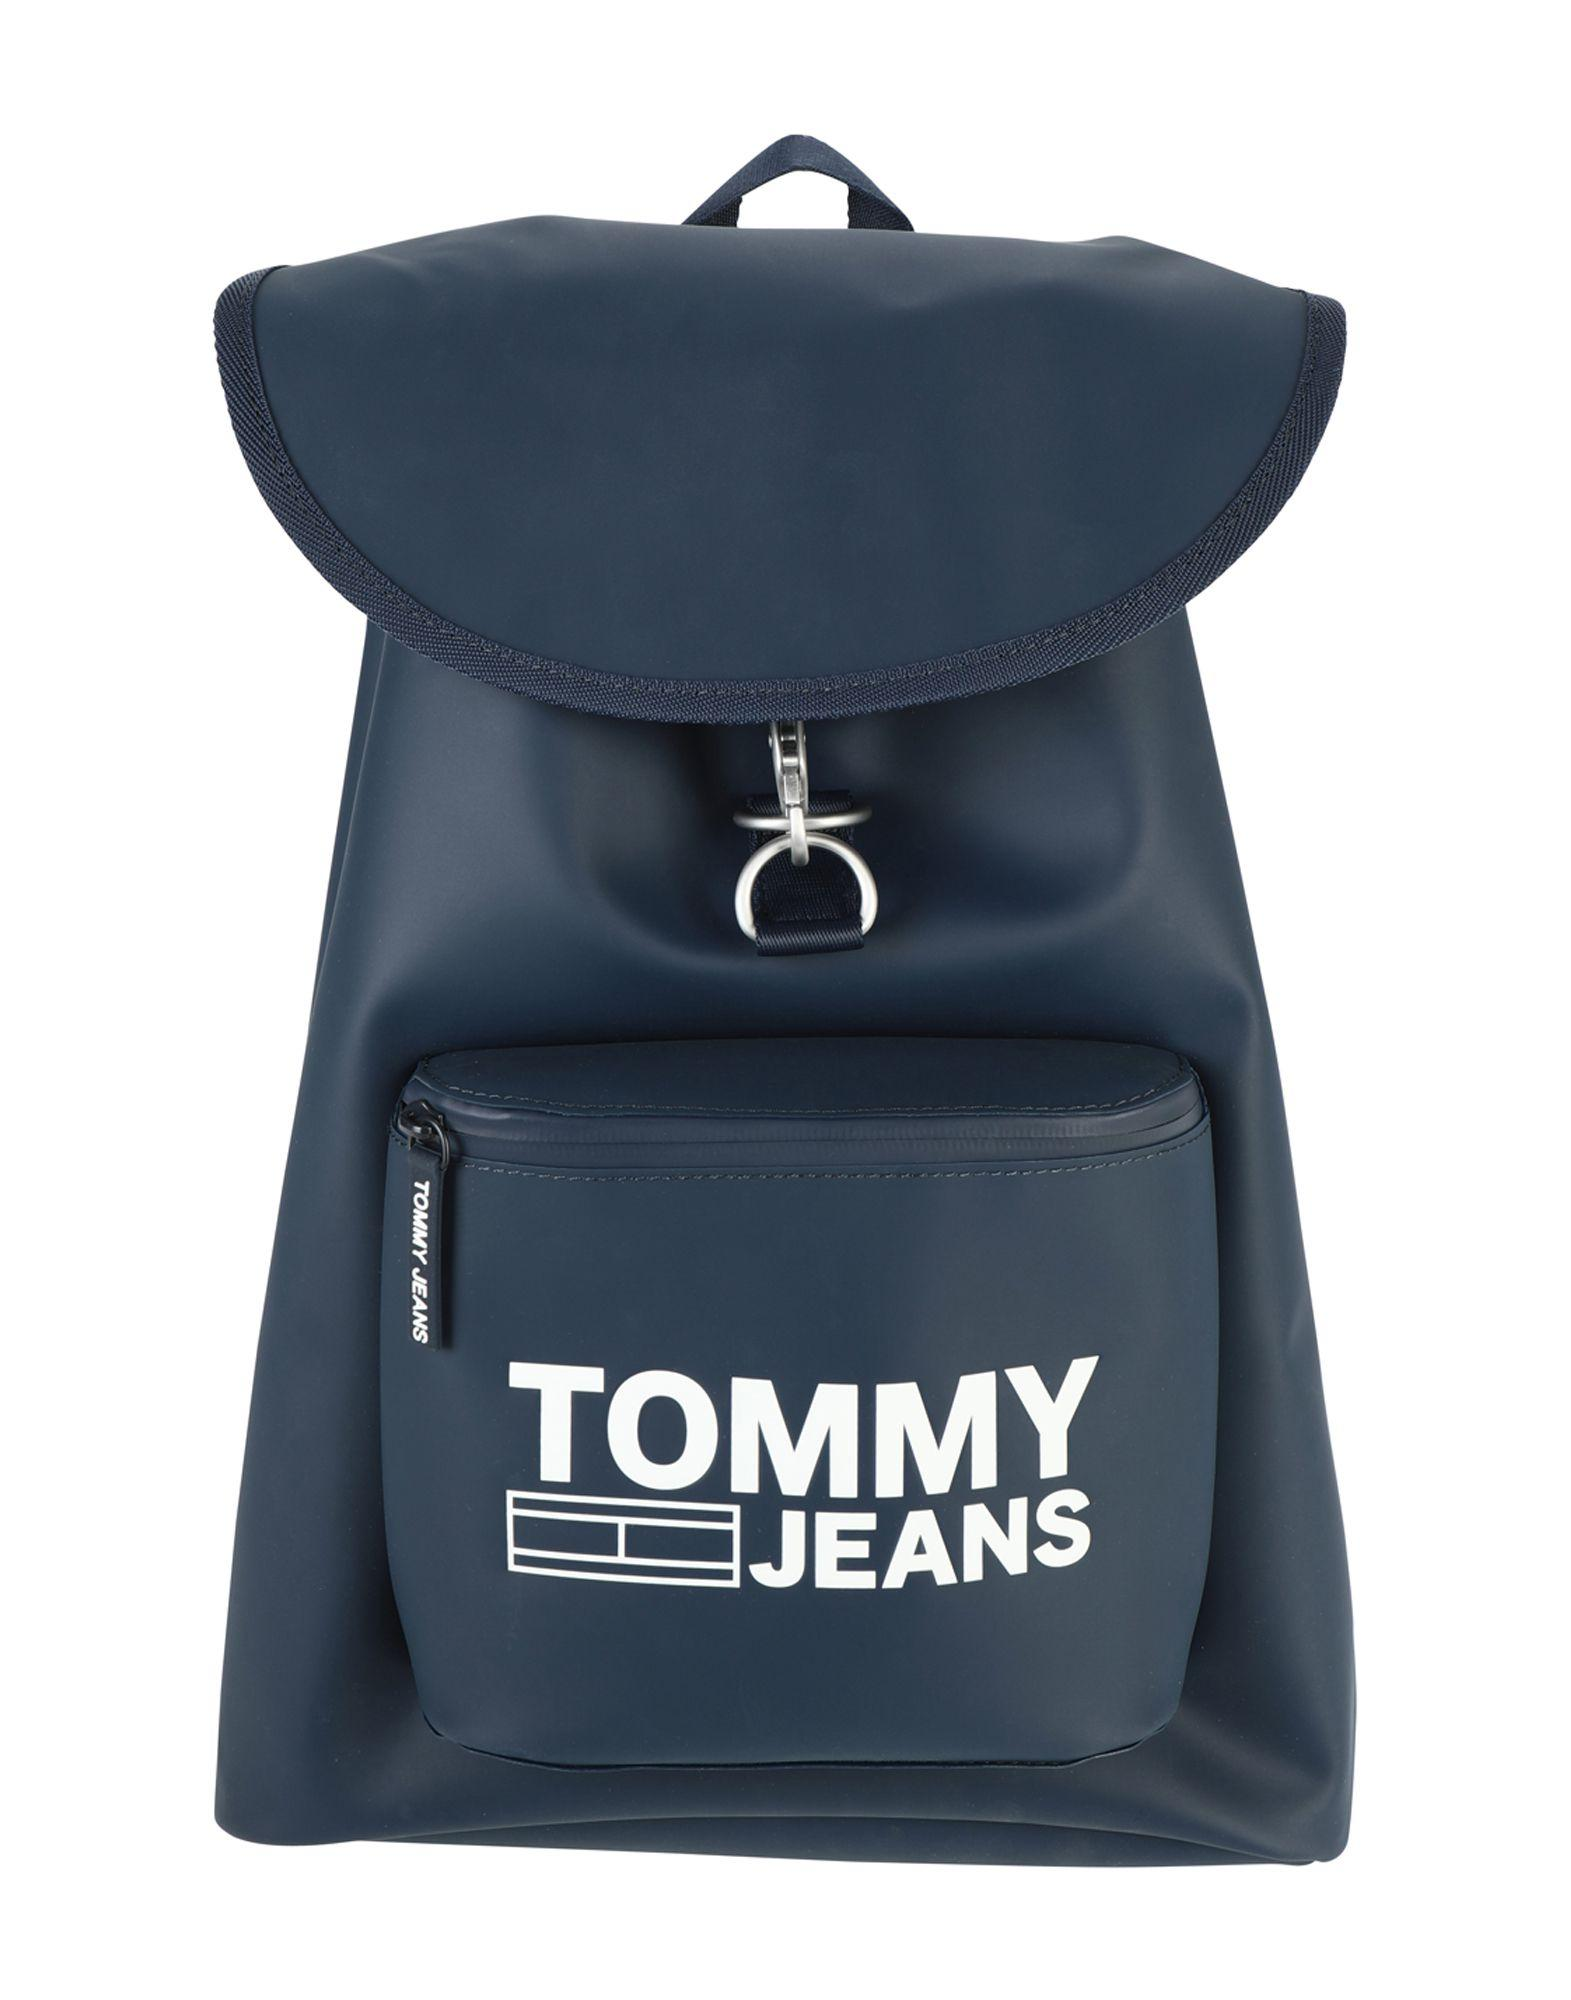 1c5da457f01 Lyst - Tommy Hilfiger Backpacks   Bum Bags in Blue